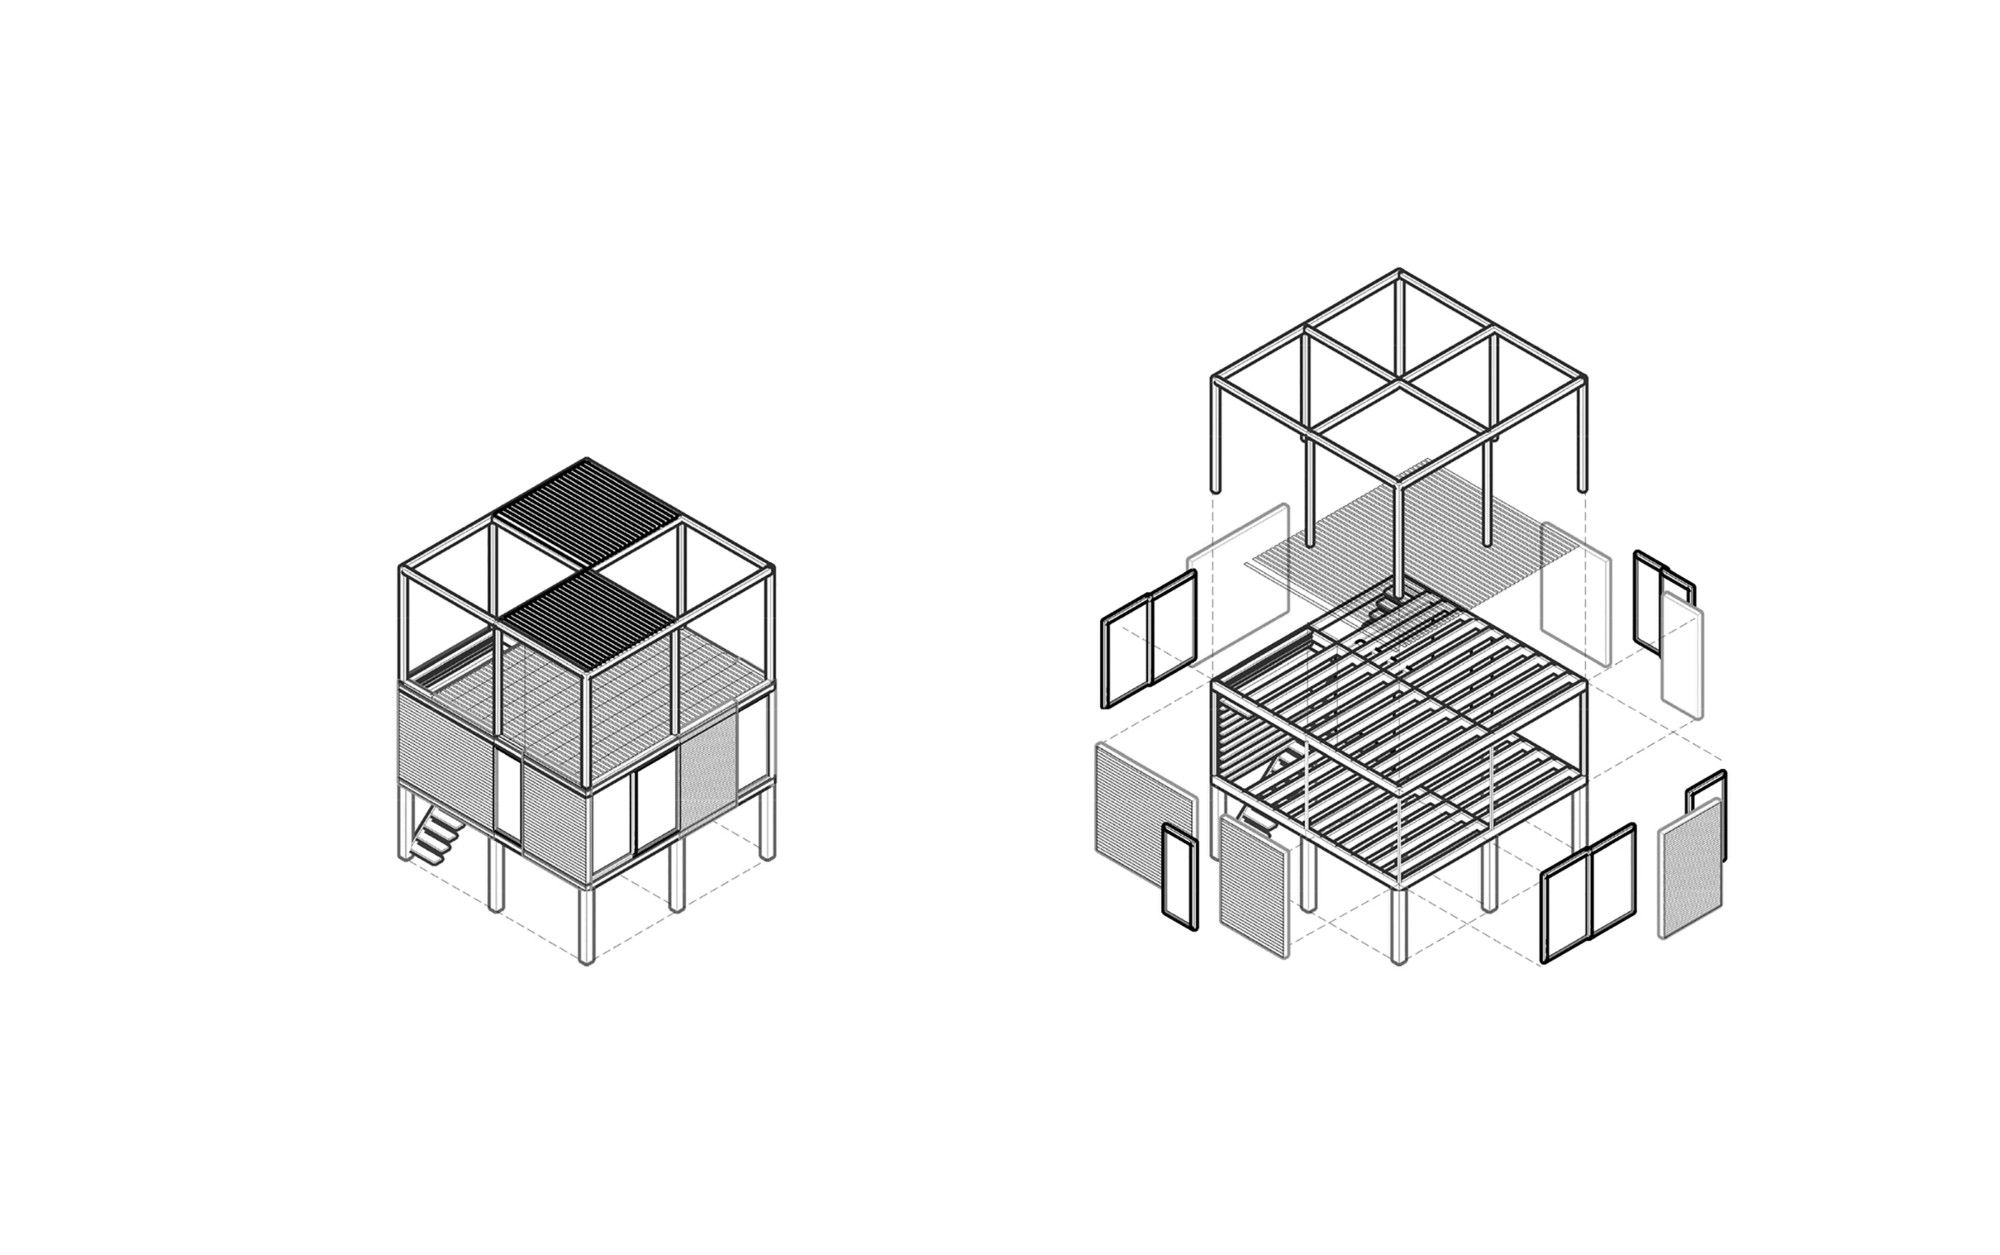 Galería - Cabaña Delta / AToT-Arquitectos todo Terreno - 26